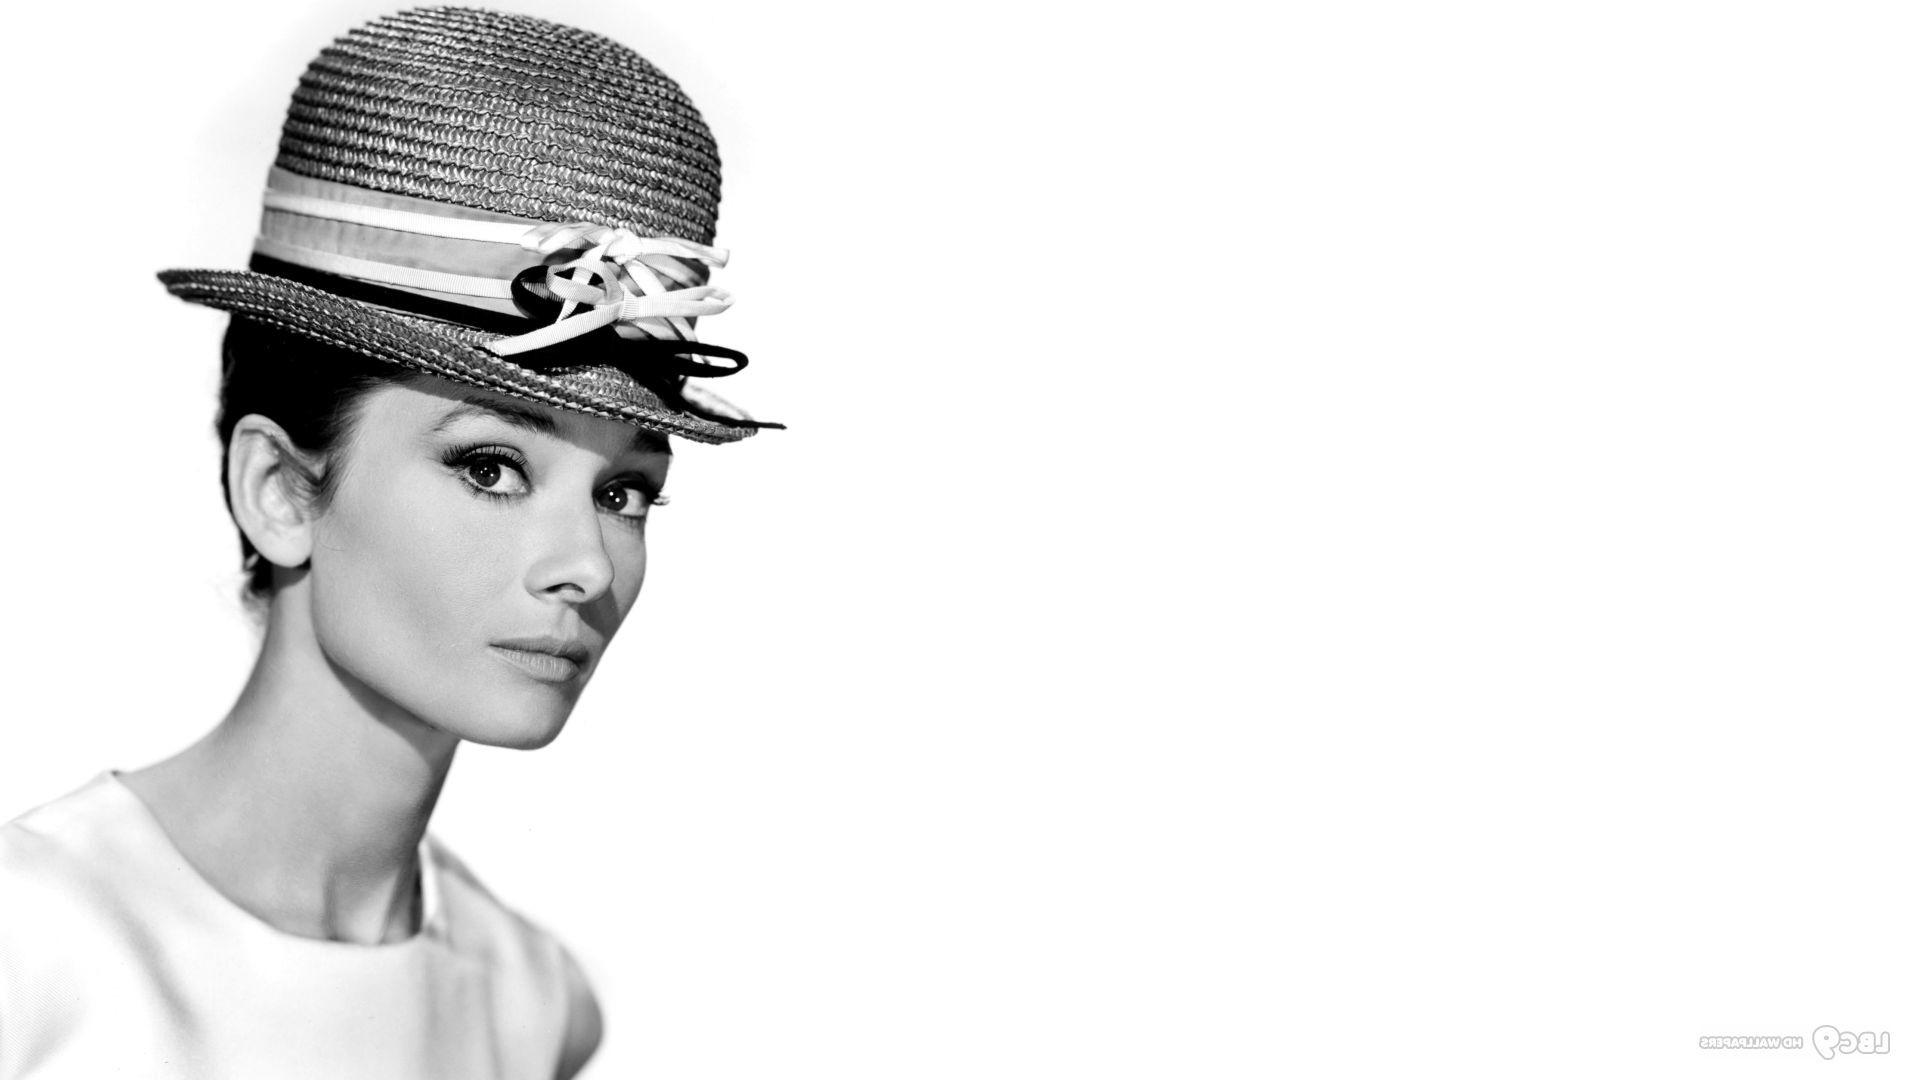 Audrey Hepburn Wallpaper 17396 Wallpaper Wallpaper hd 1920x1080